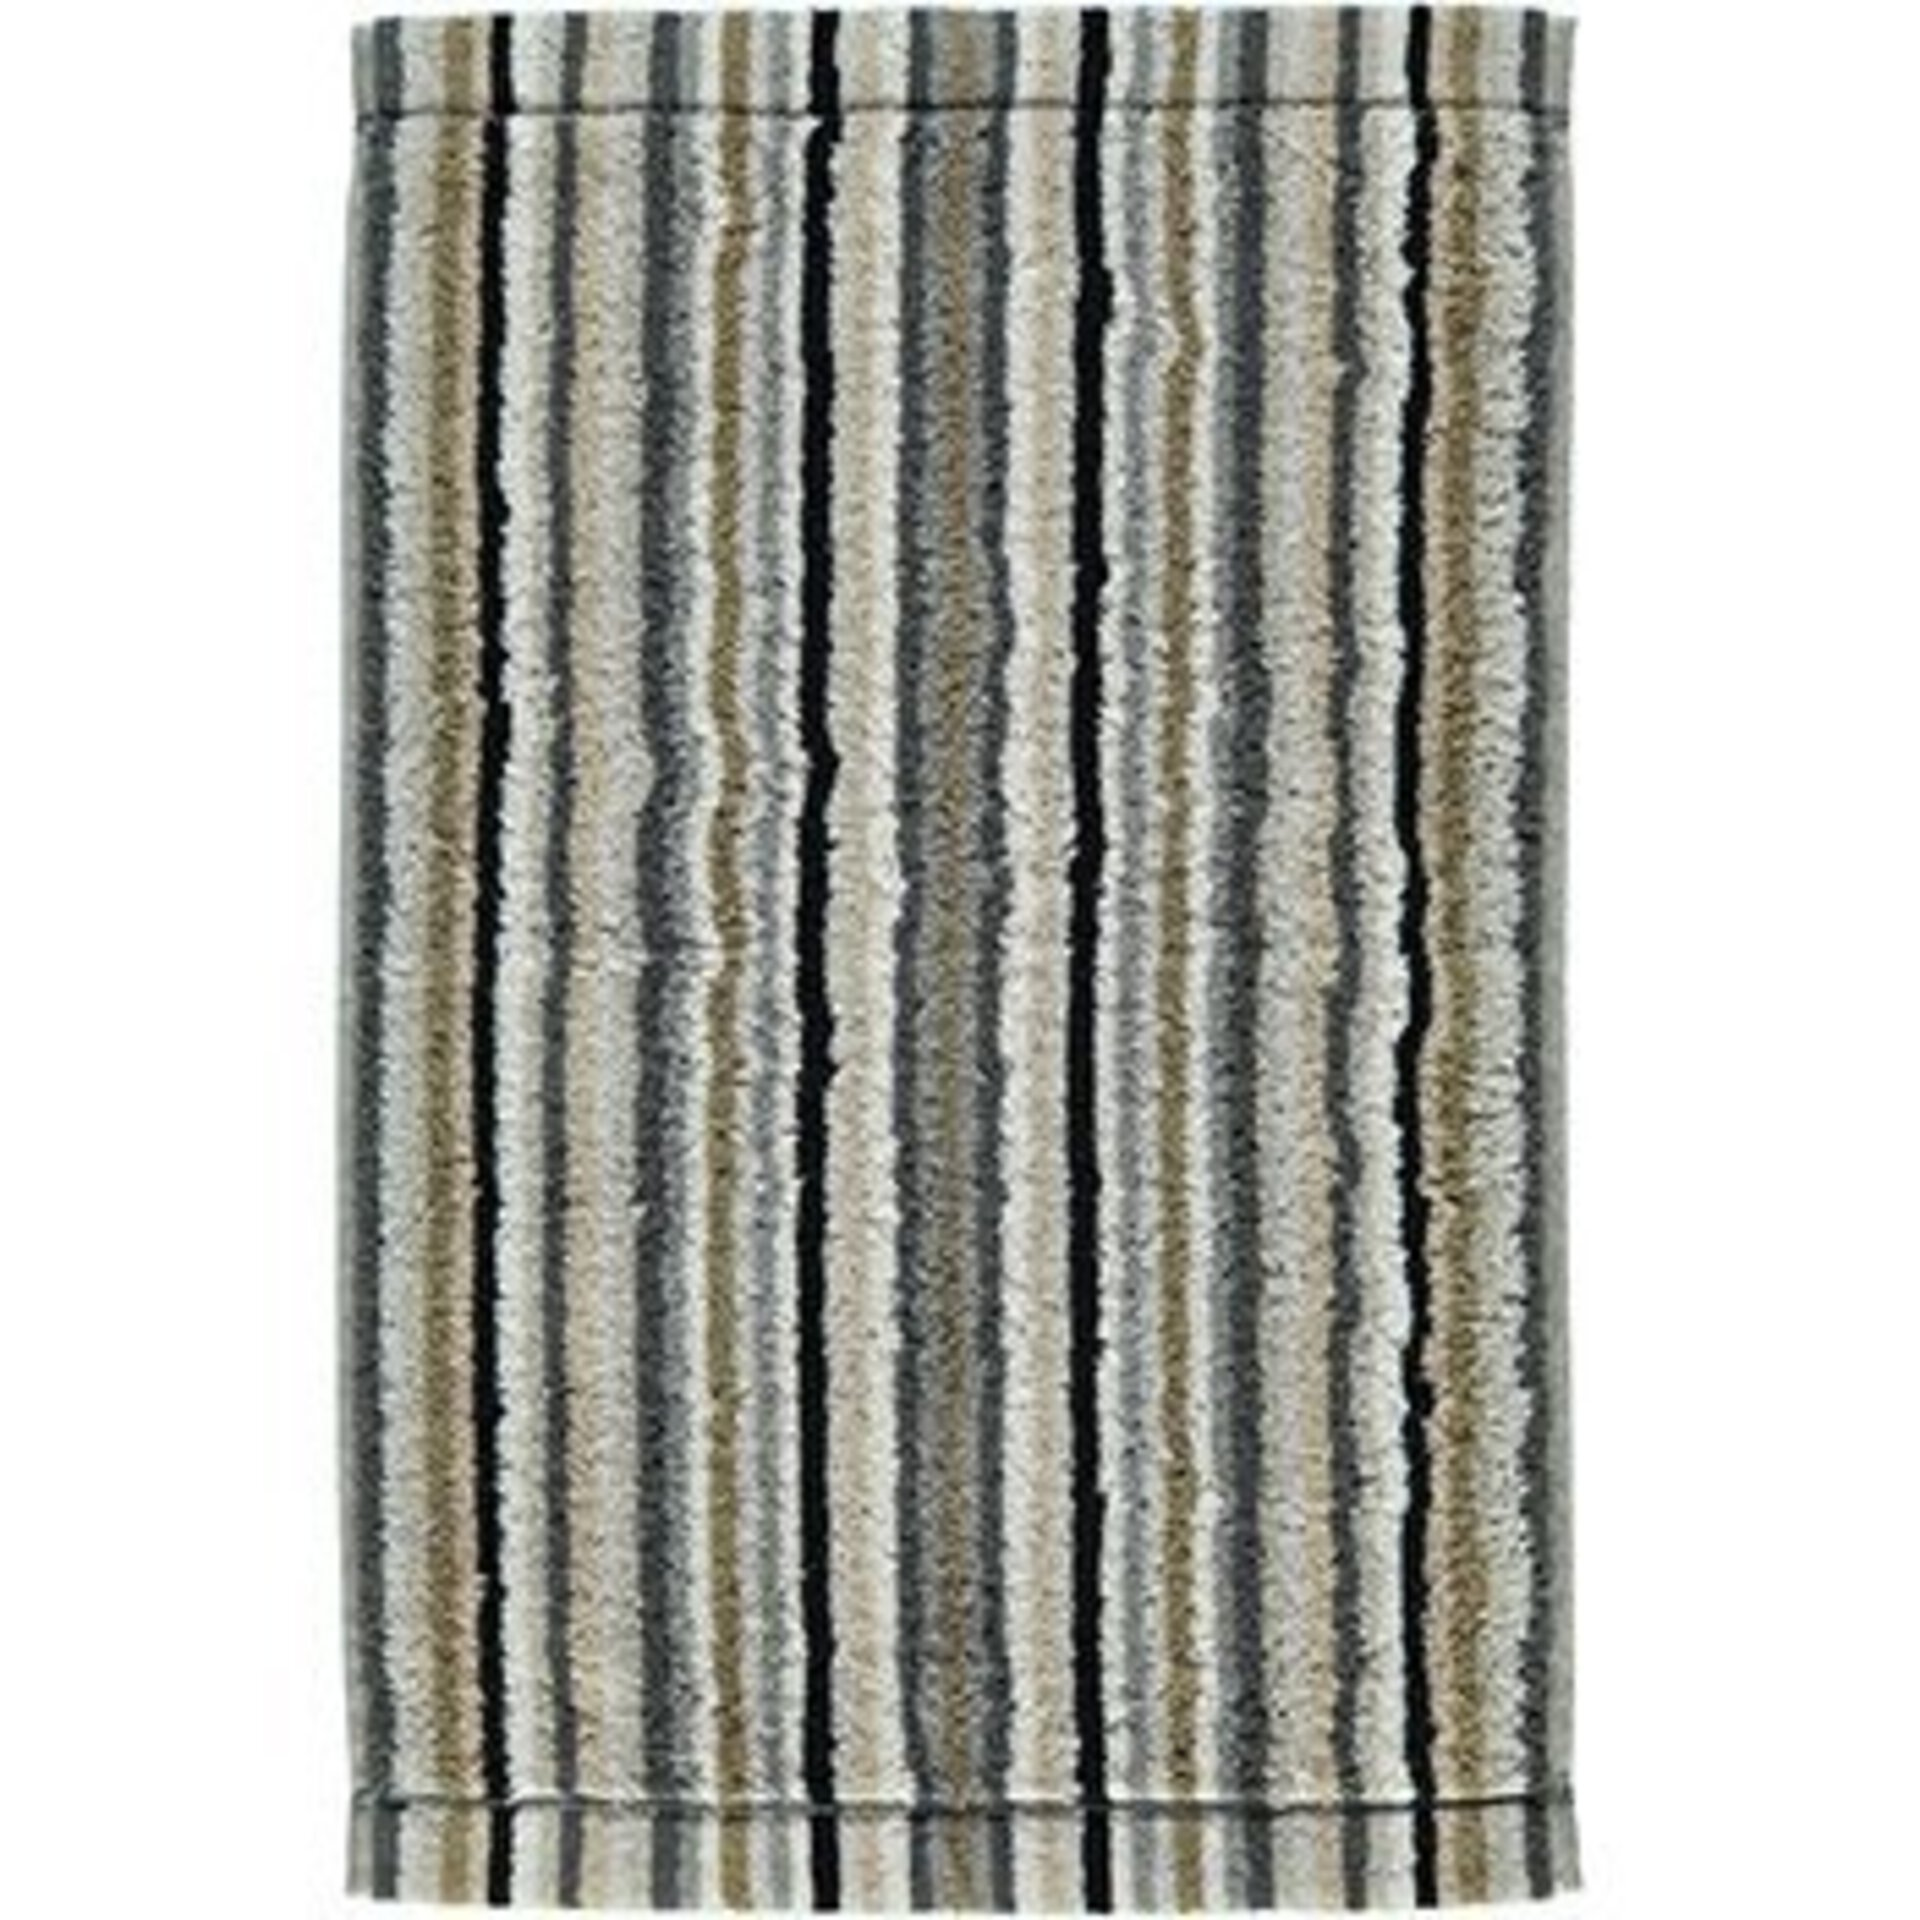 Gästetuch Lifestyle Cawö Textil 30 x 50 cm